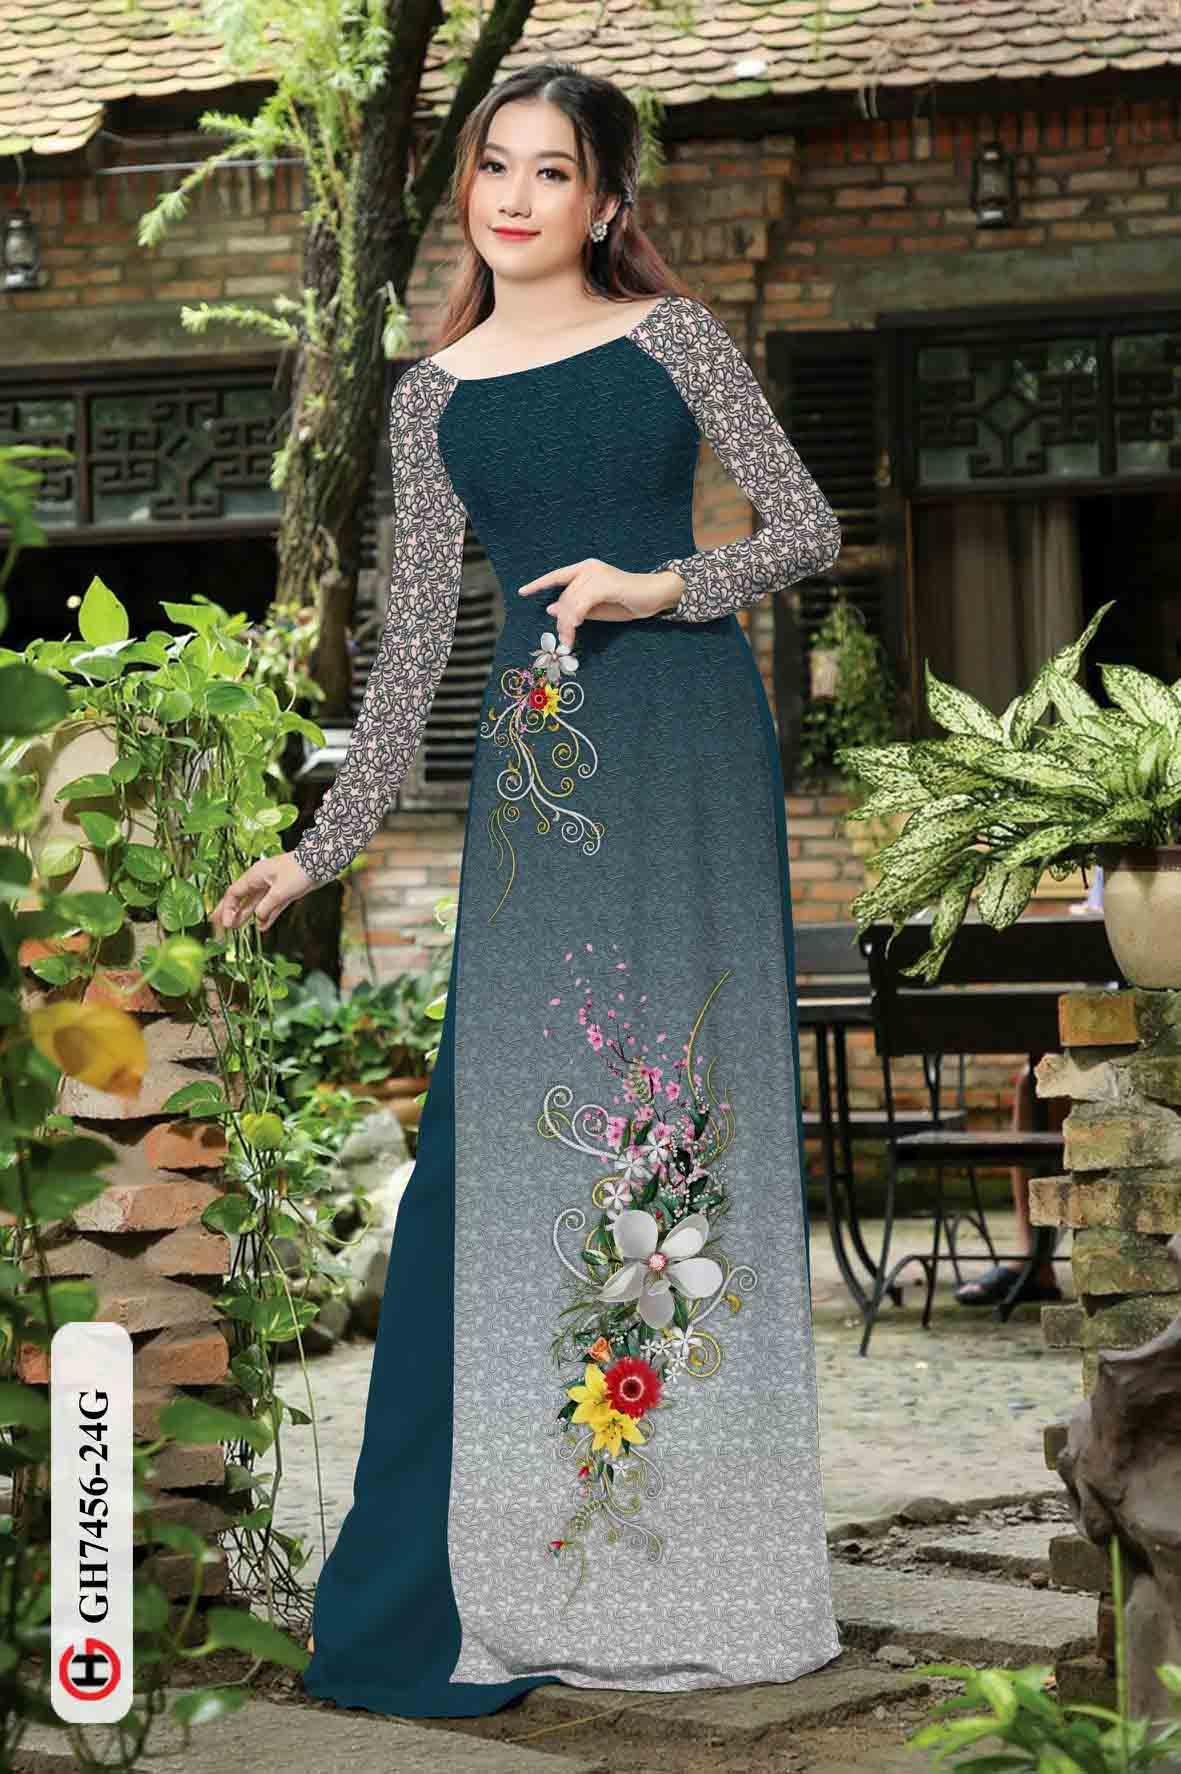 Vải áo dài hoa in 3D AD GH7456 32